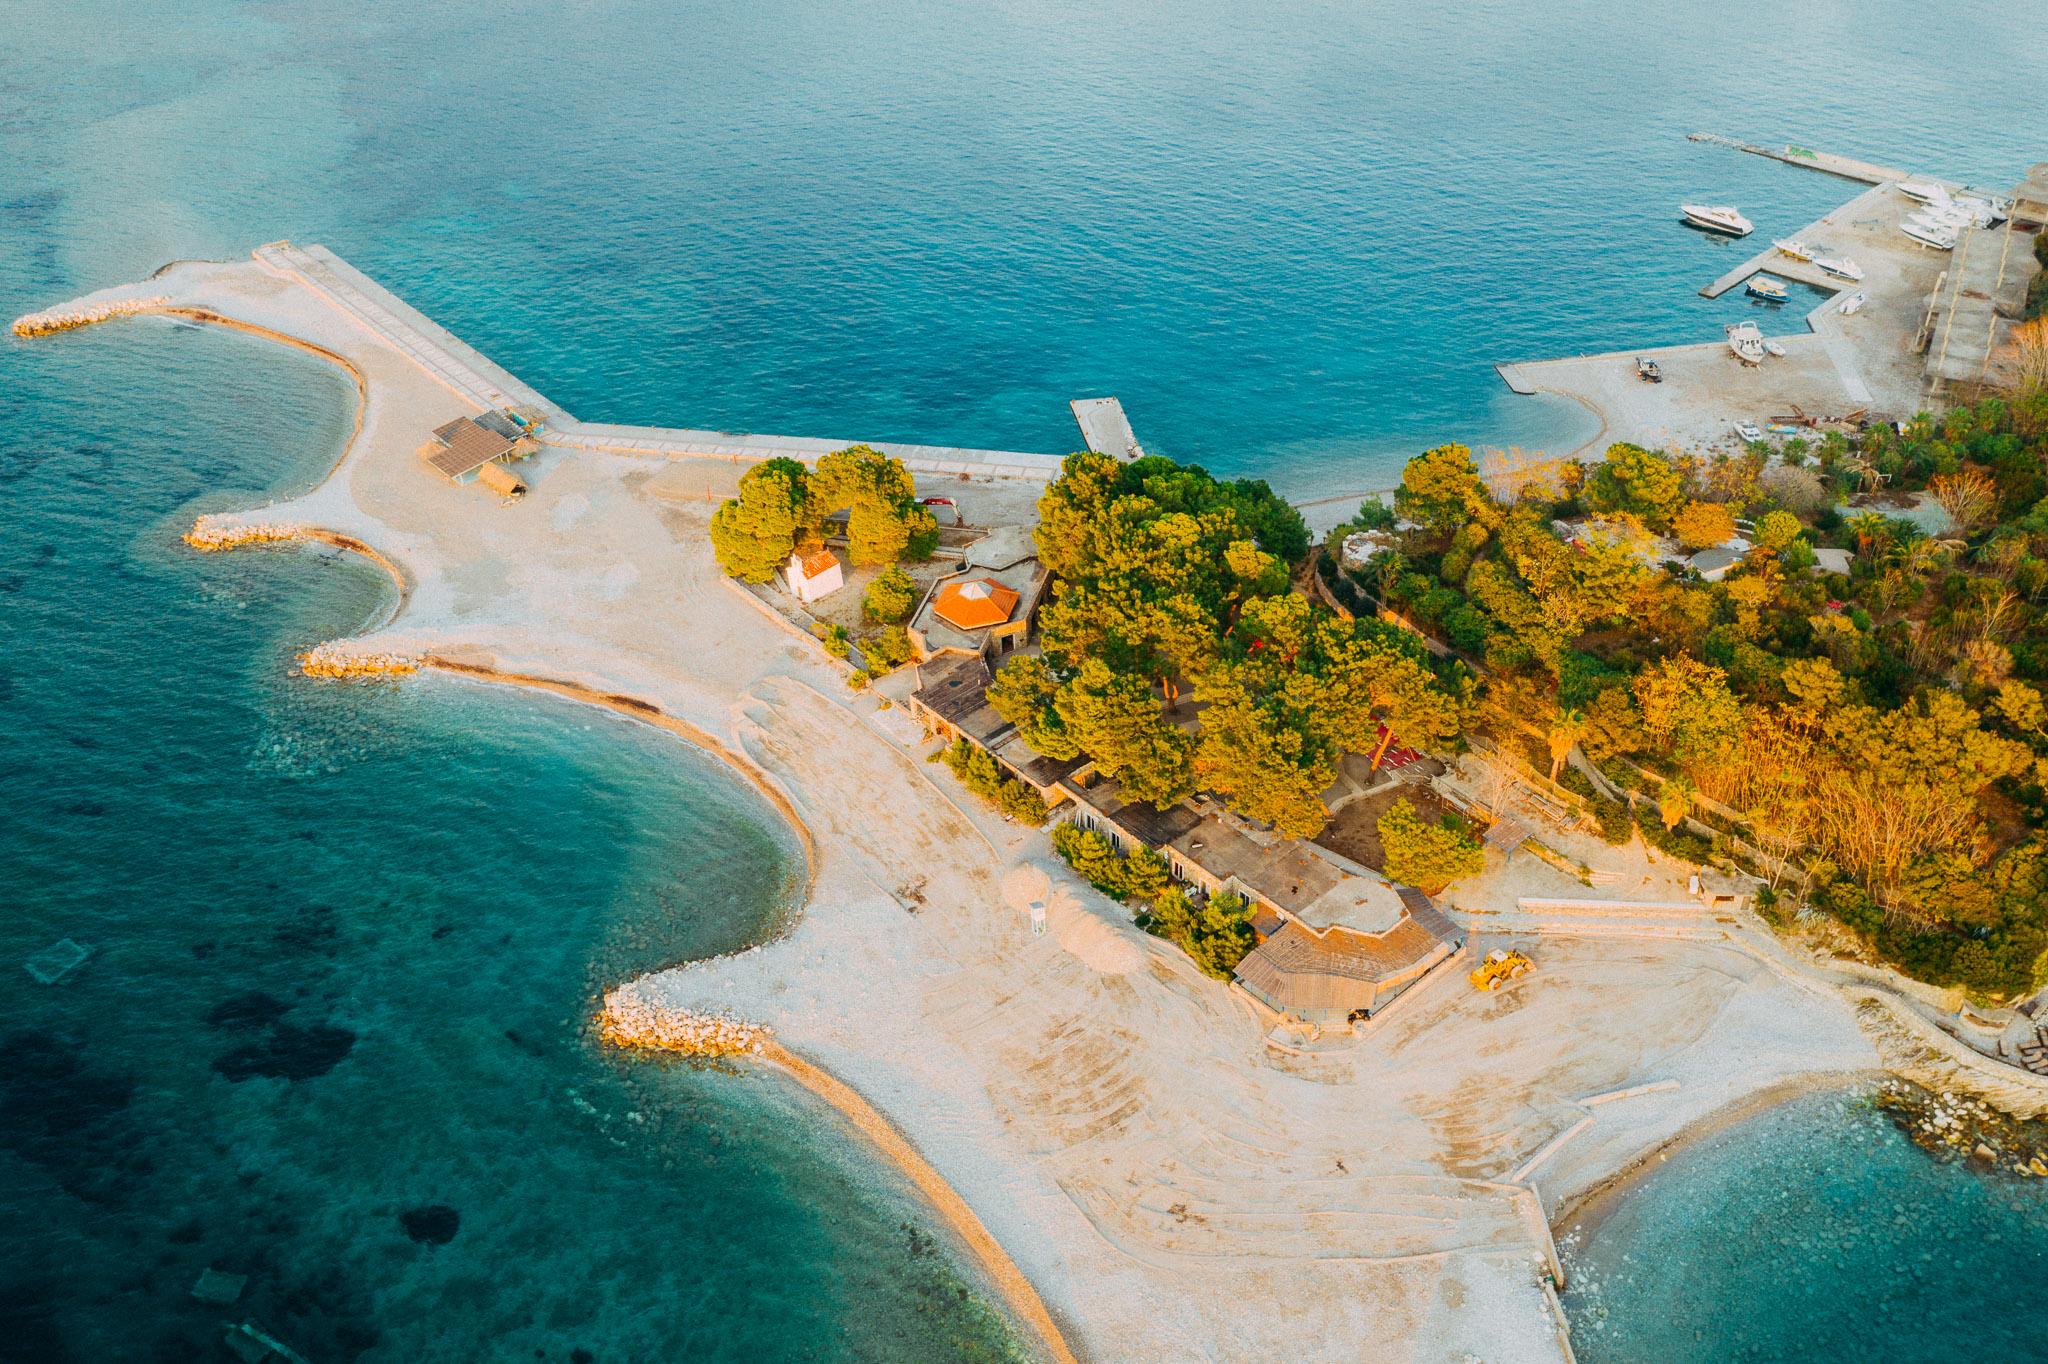 PJ Rankin_Drop in the Ocean_Montenegro-29.jpg